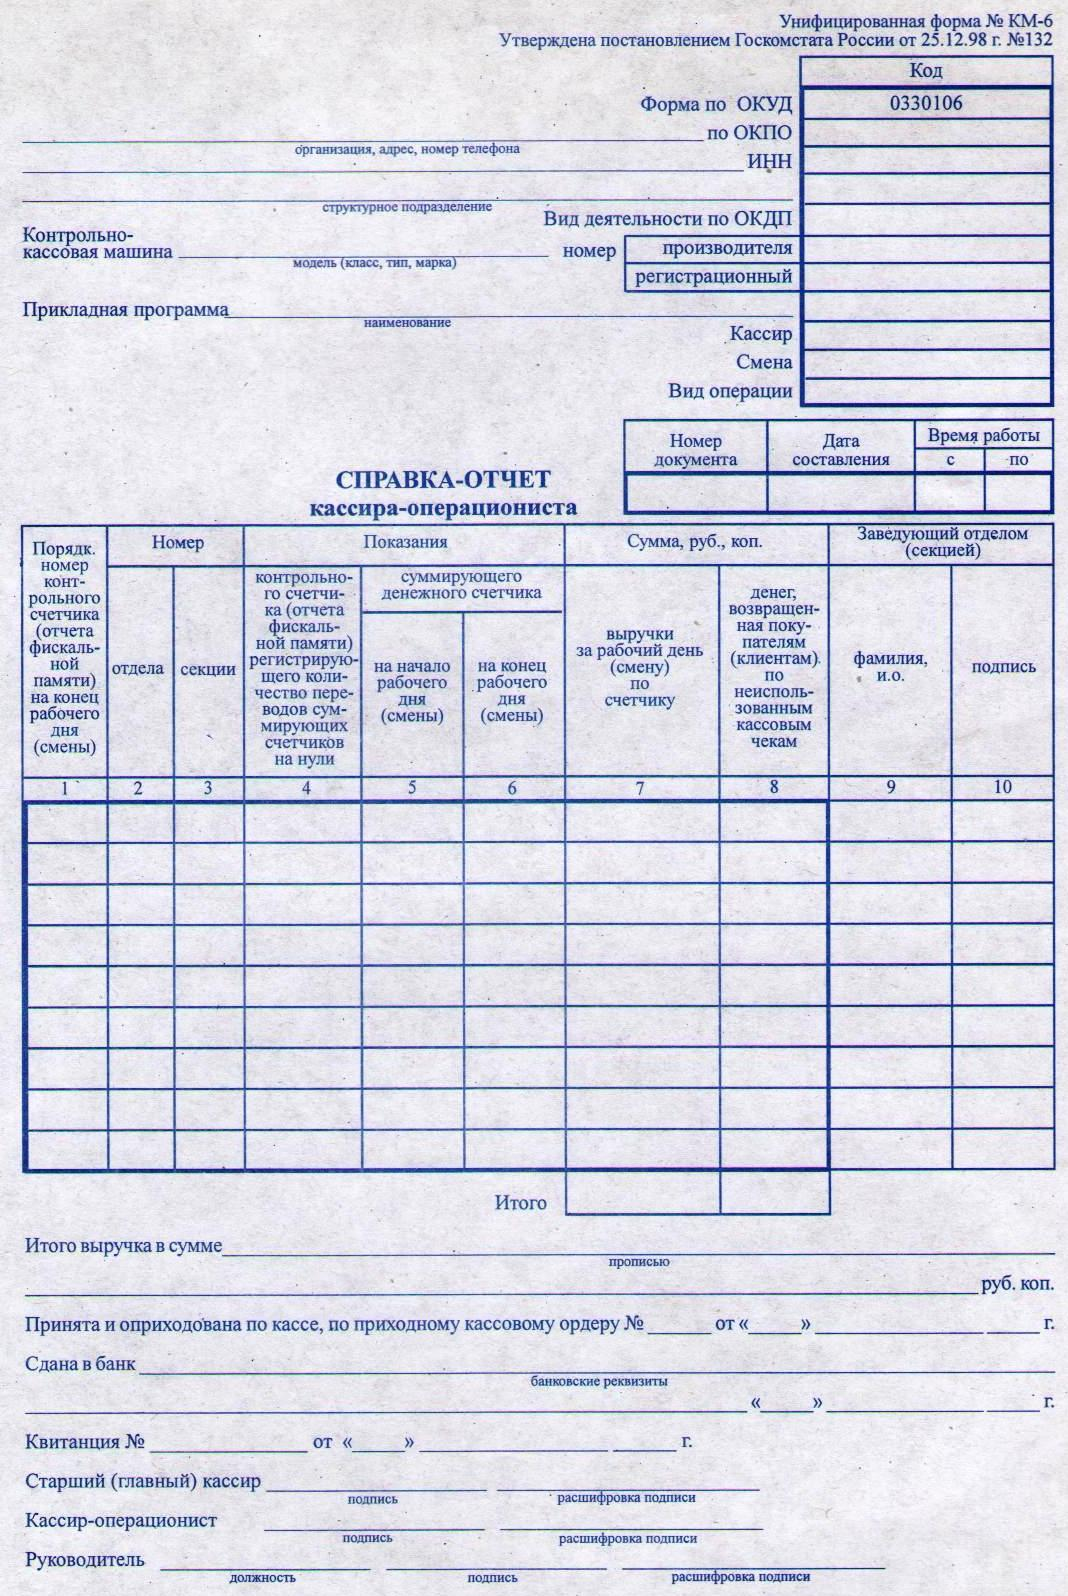 Справка-отчет кассира-операциониста (КМ-6)